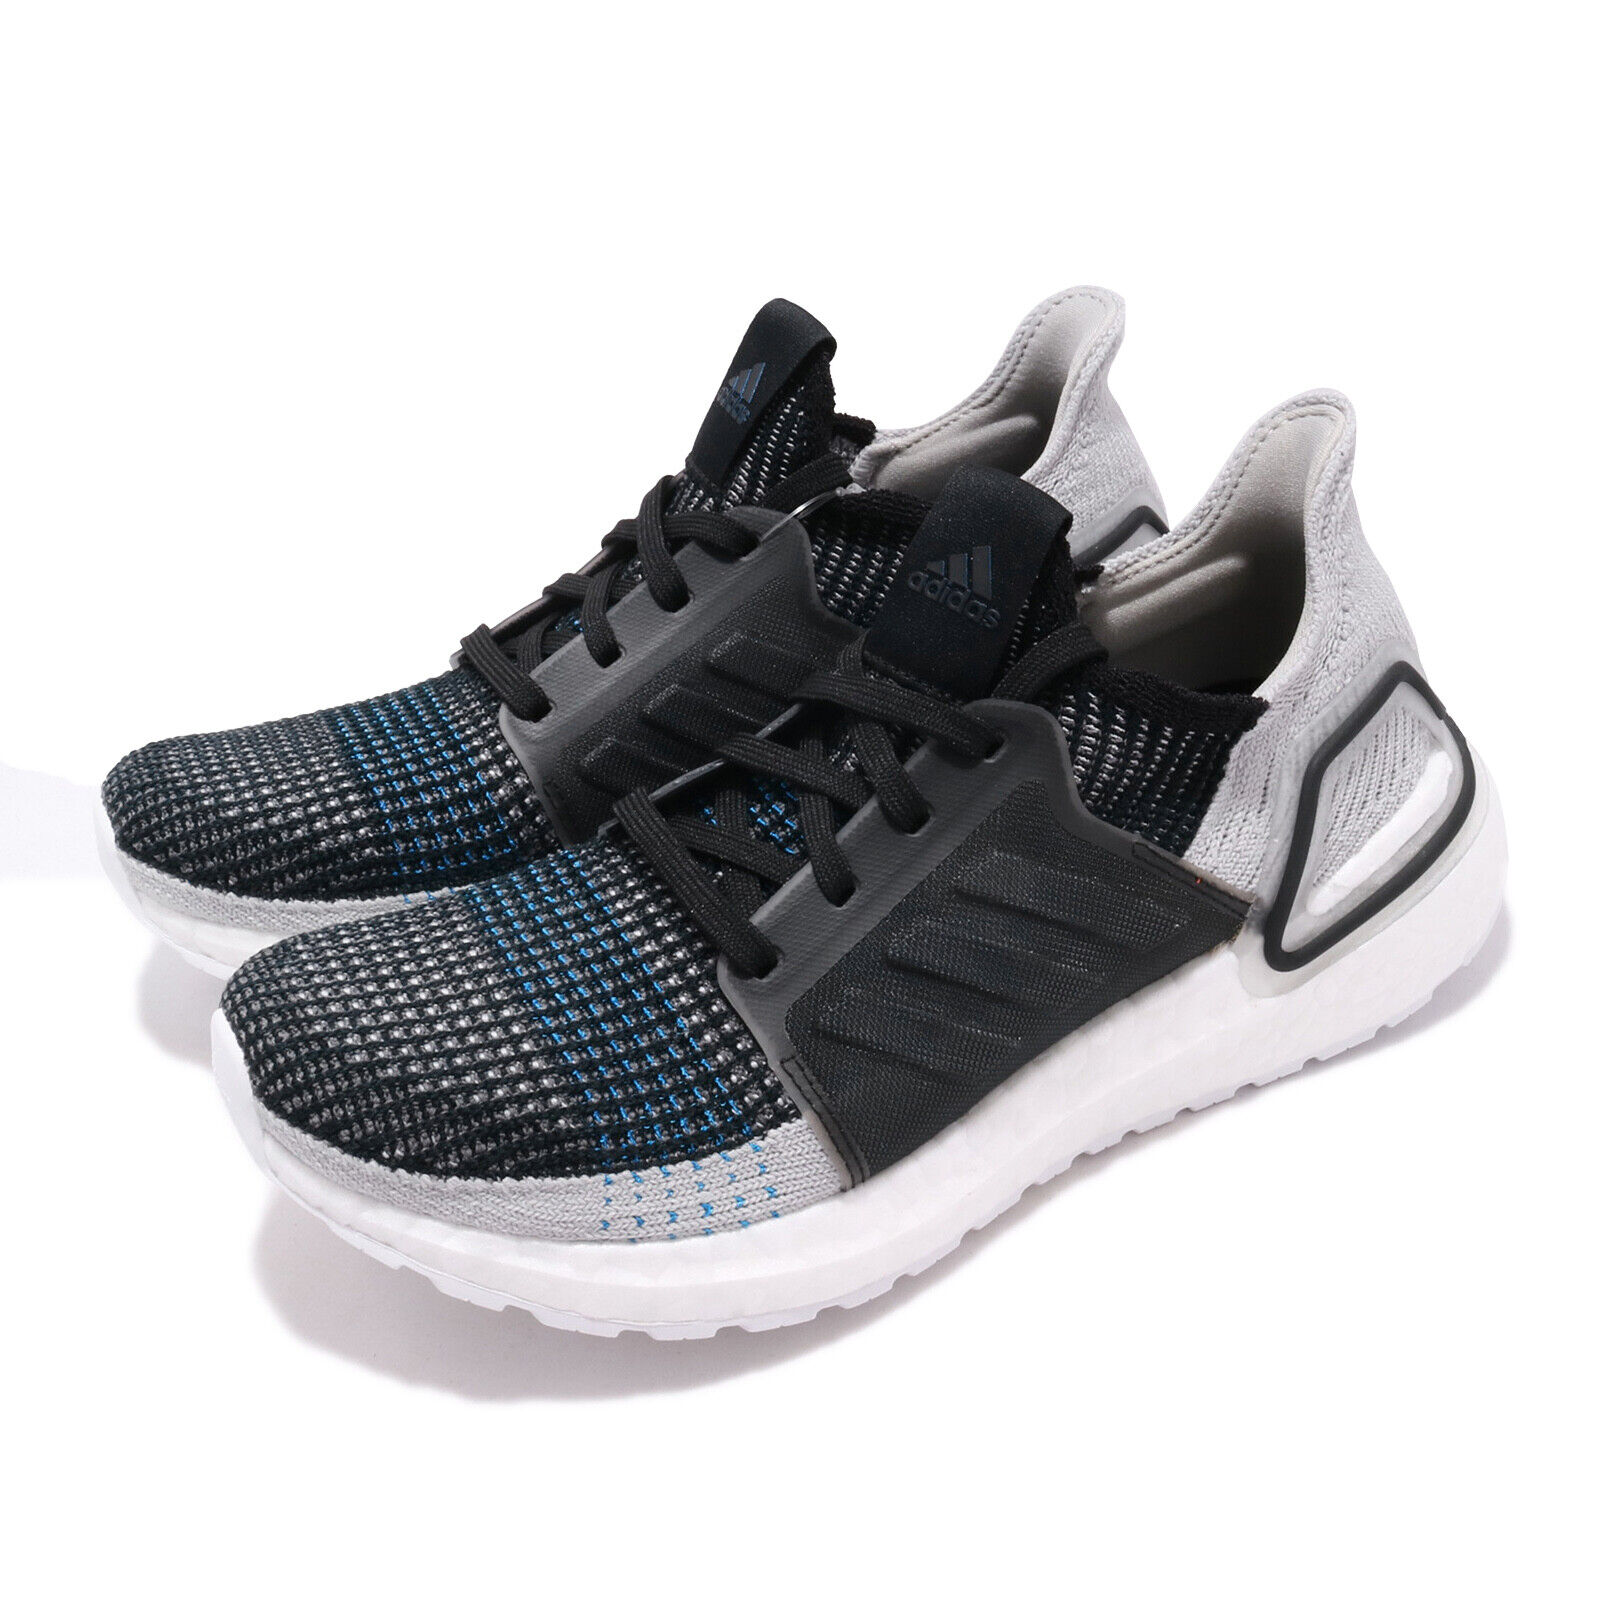 Adidas UltraBOOST 19 Negro gris Azul Hombres Para Zapatos Tenis Informales Correr F35242